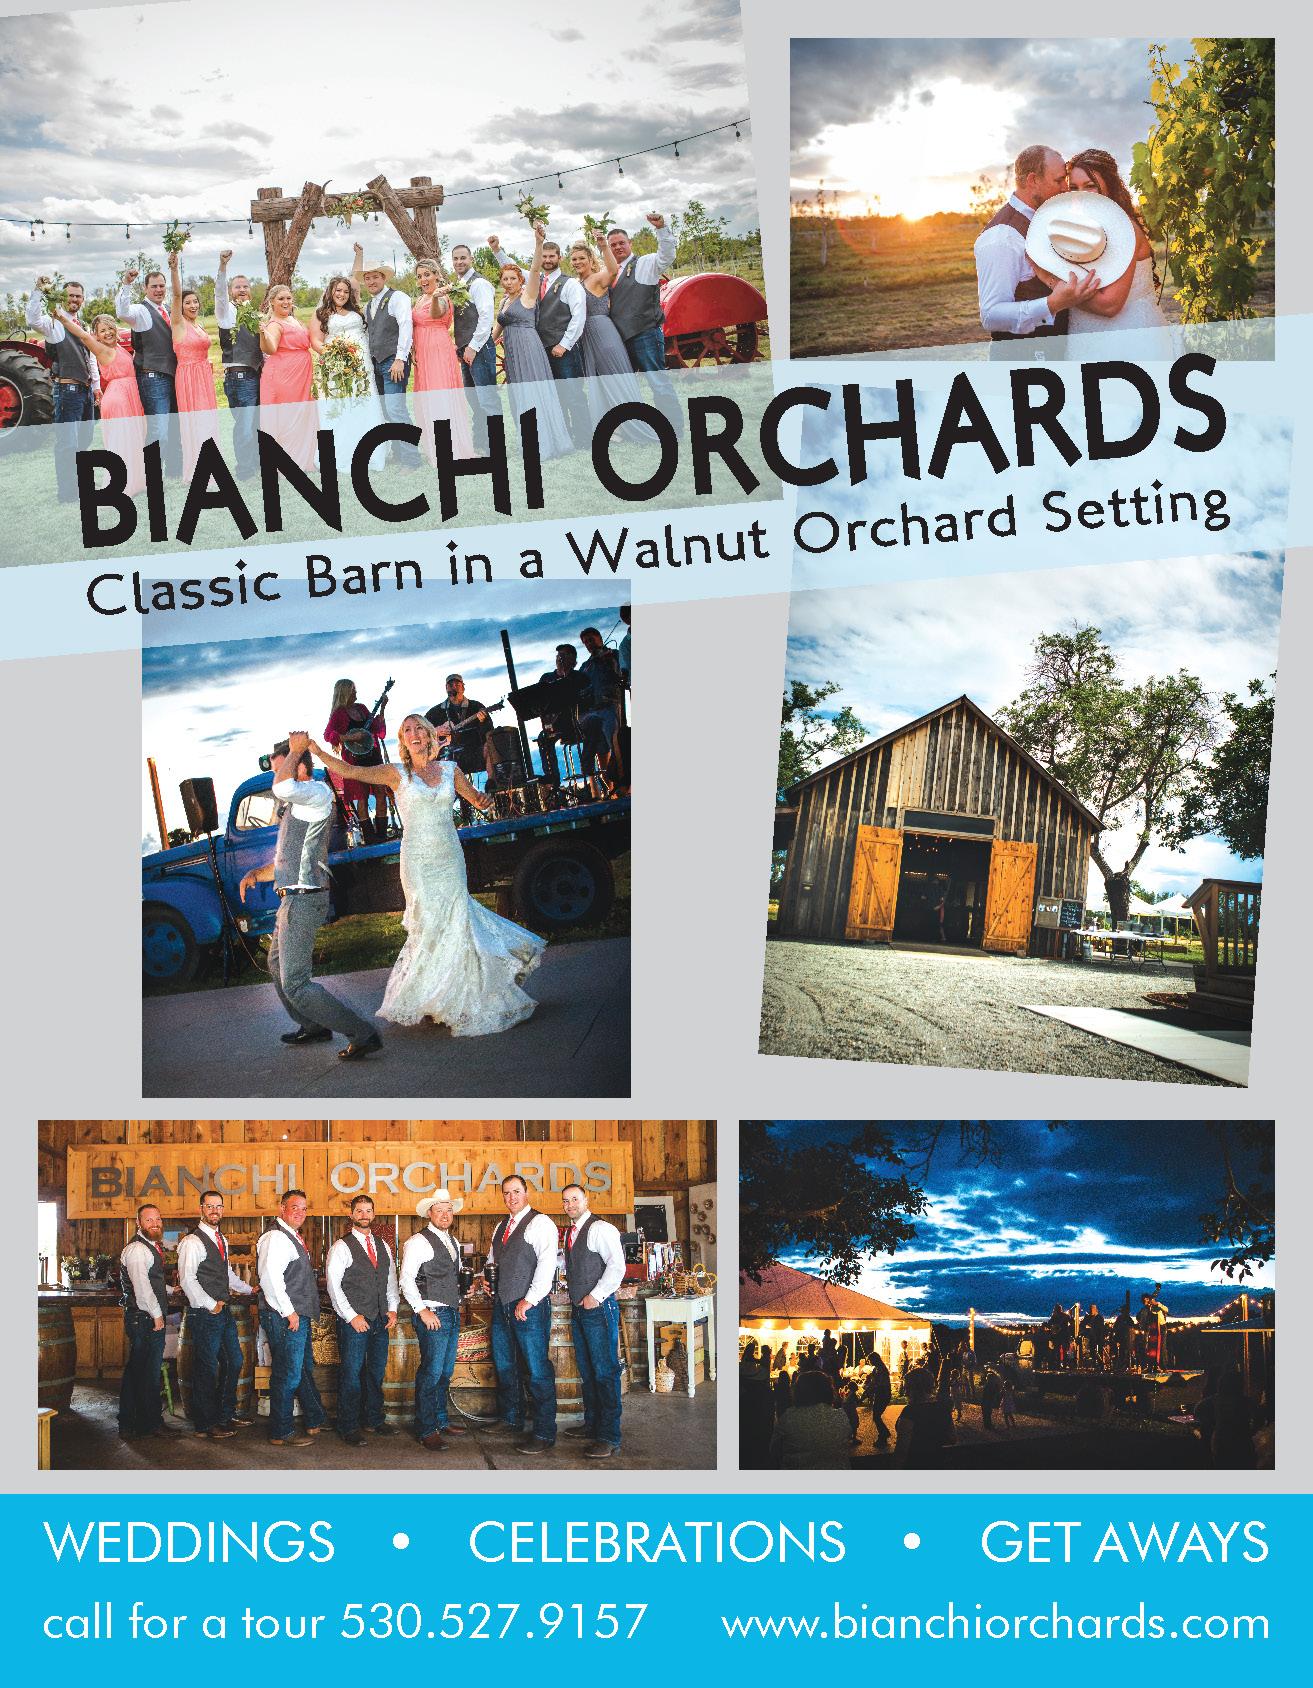 edding Wedding Bridal Guide Bianchi Orchards wedding venue classic barn